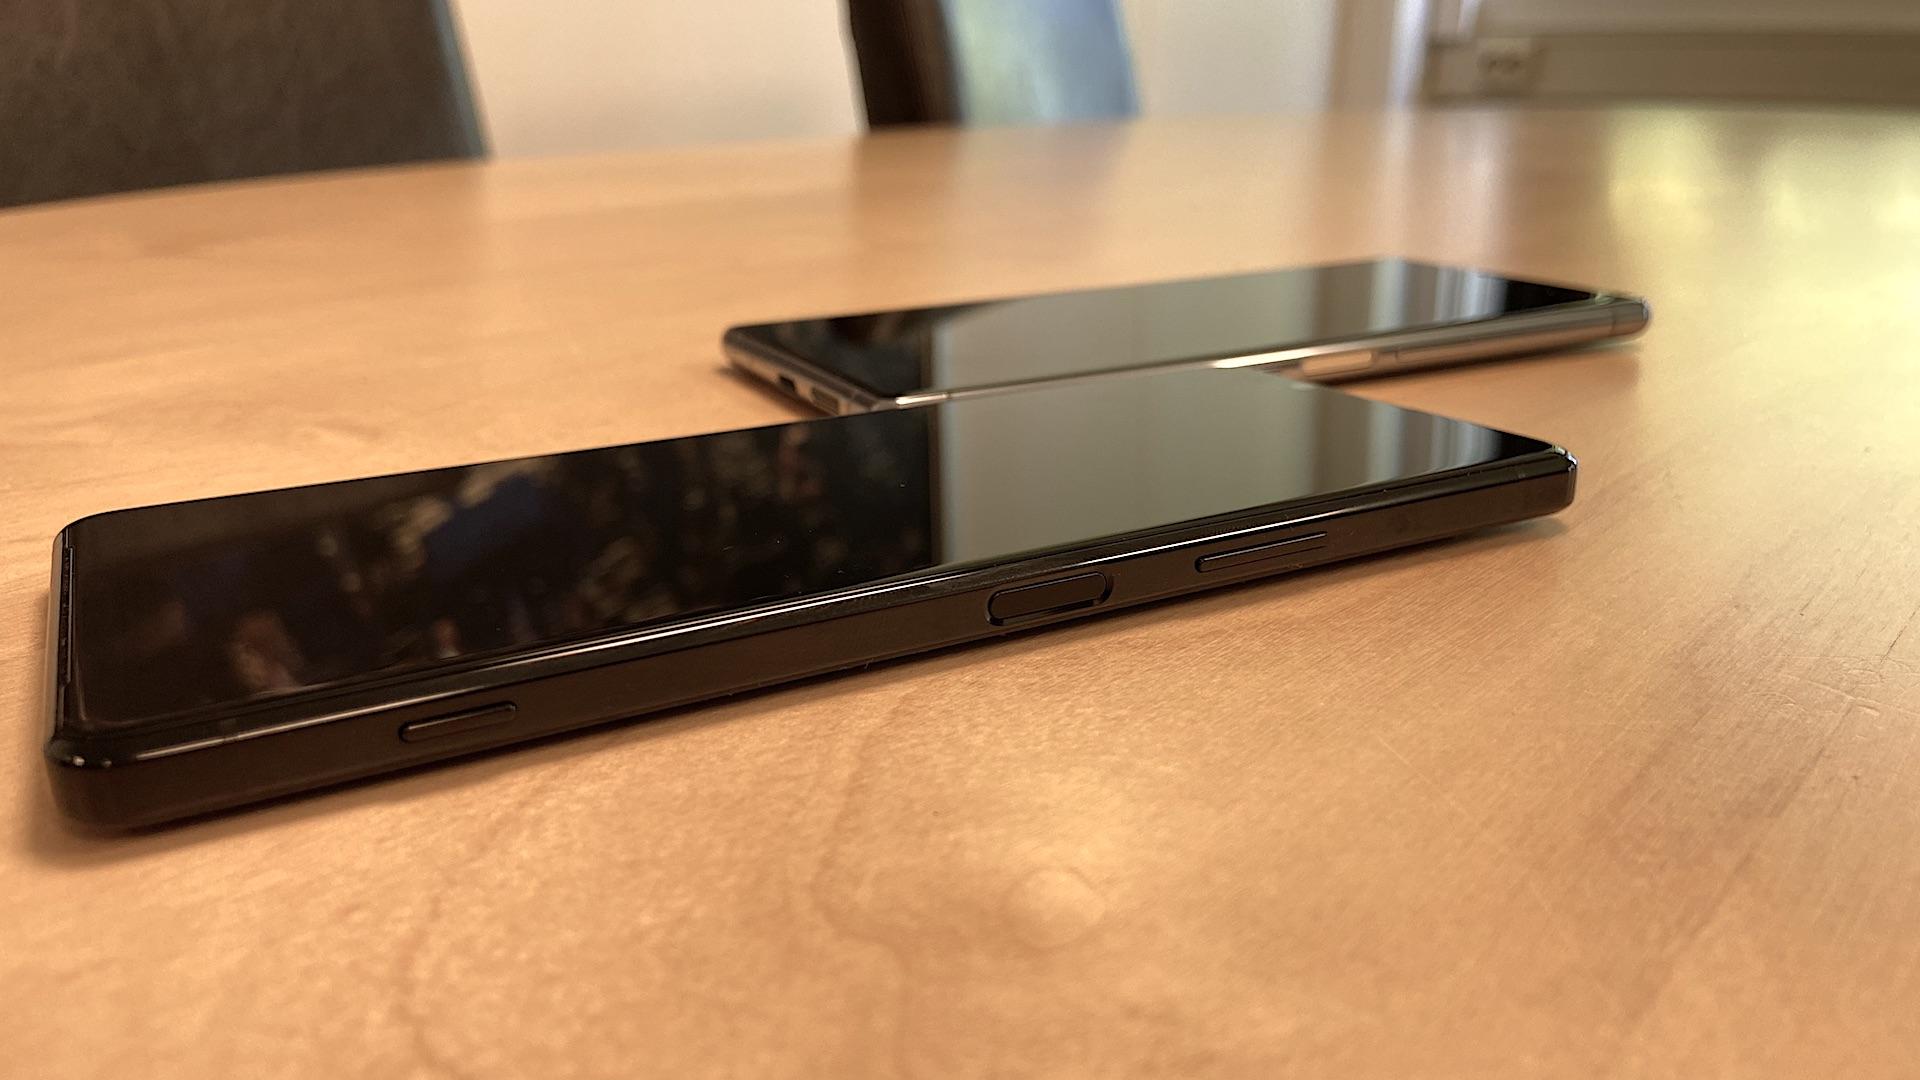 Fingeraftrykslæser Xperia1II - Sony Xperia 1 II